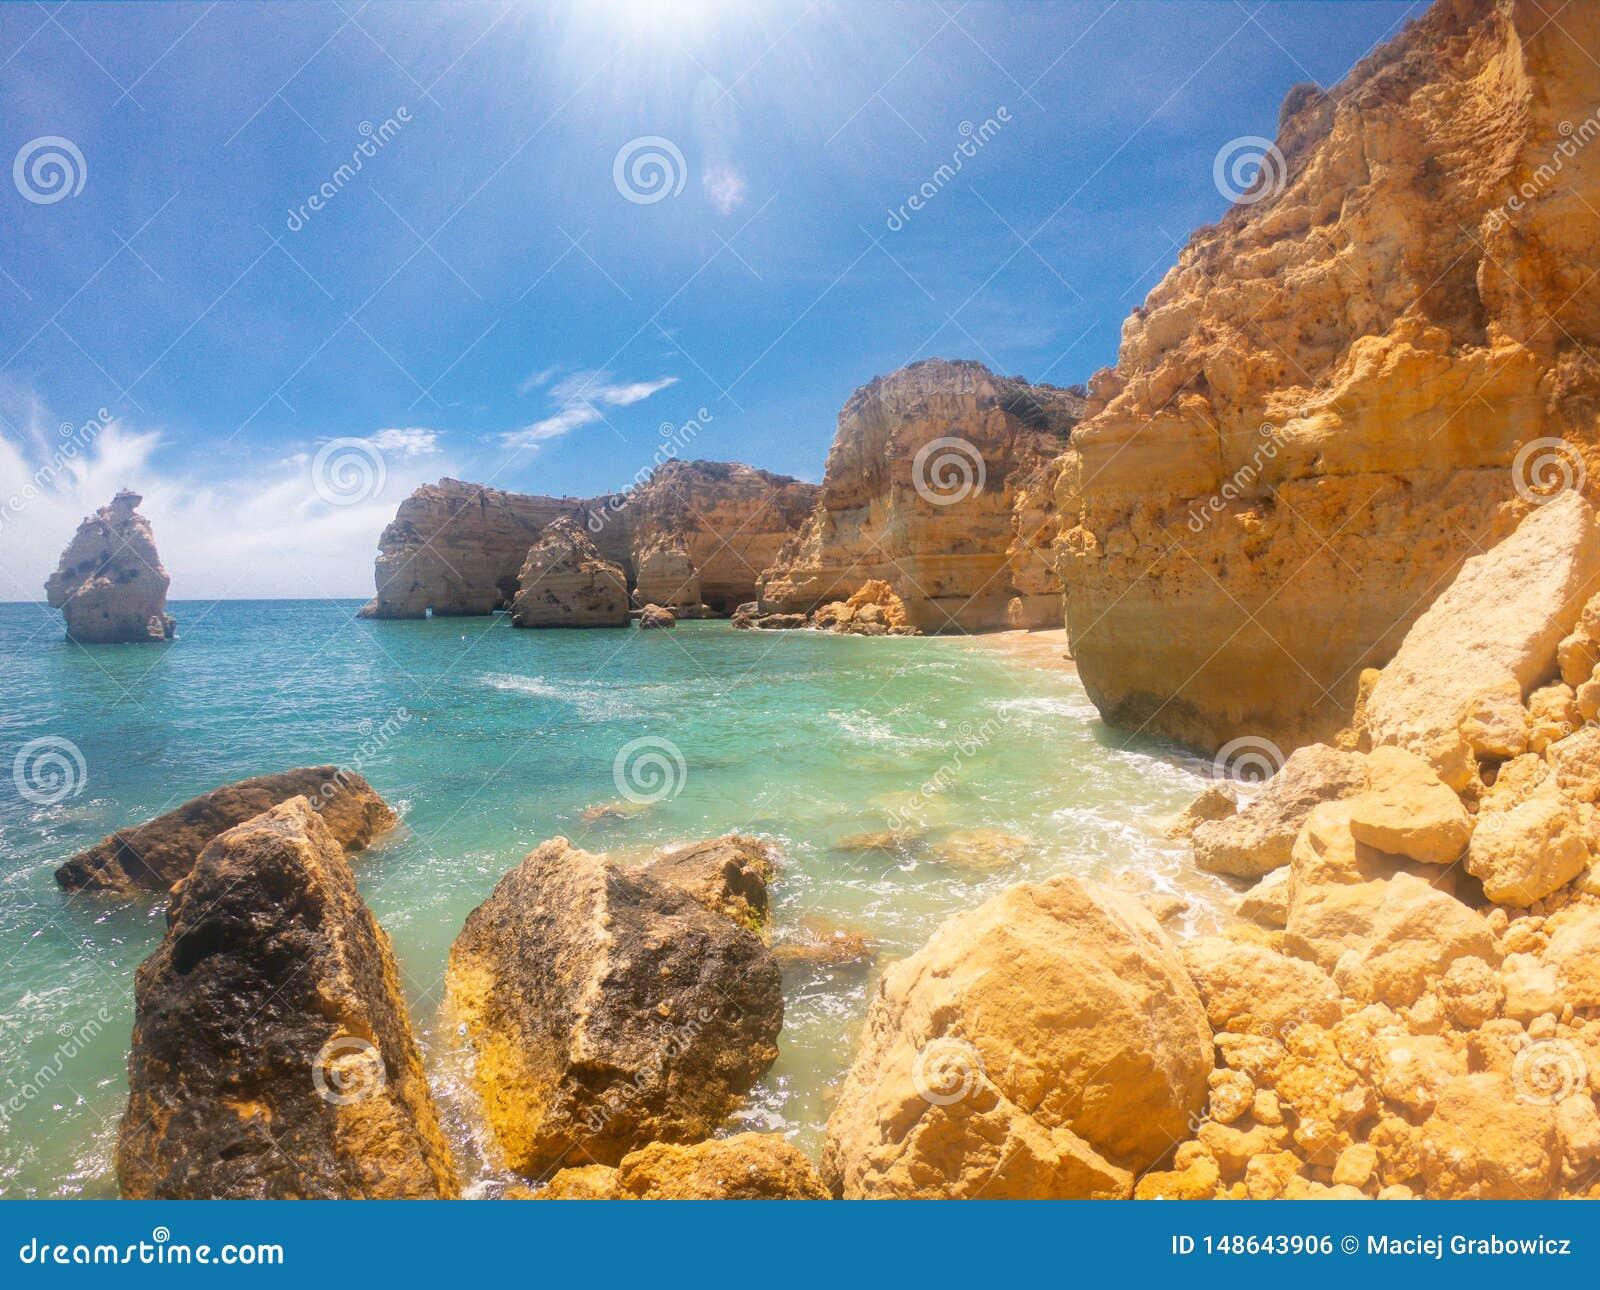 Praya de Marinha most beautiful beach in Algarve, Portugal. Cliffs on Coast of Atlantic ocean against blue sky